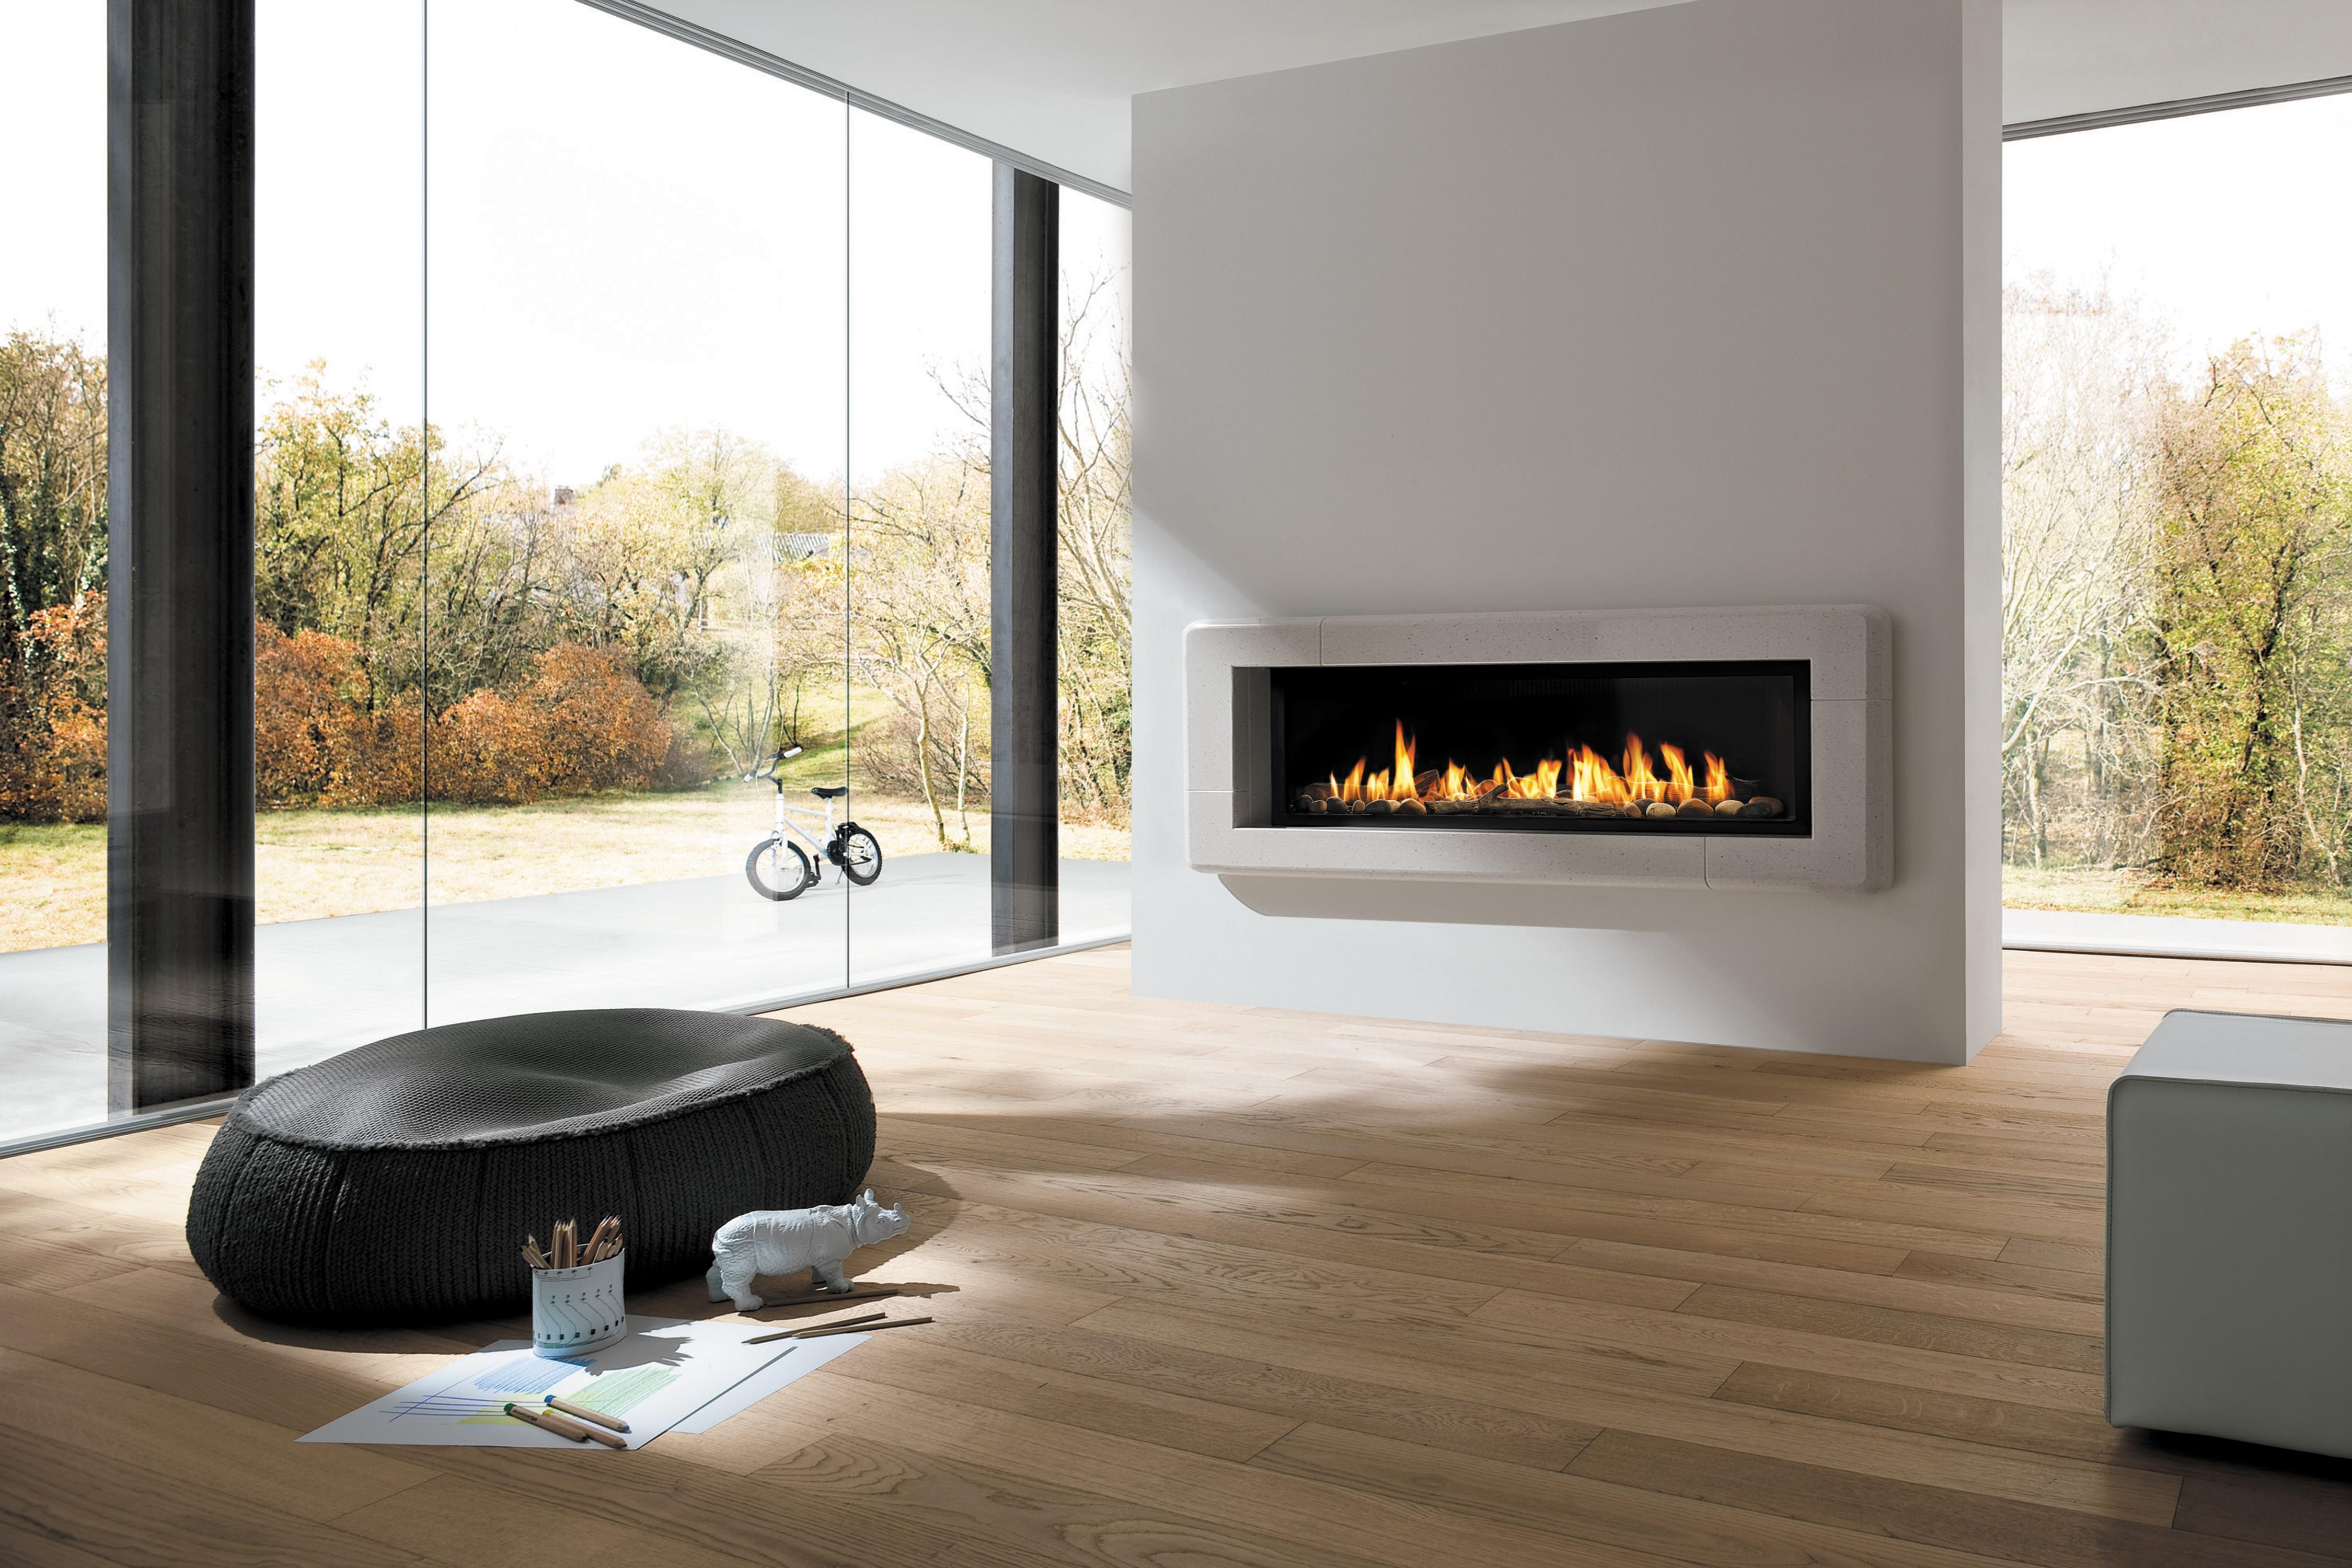 Fireplace Inserts Spokane Part - 37: Home | Accent Fireplace U0026 Spas